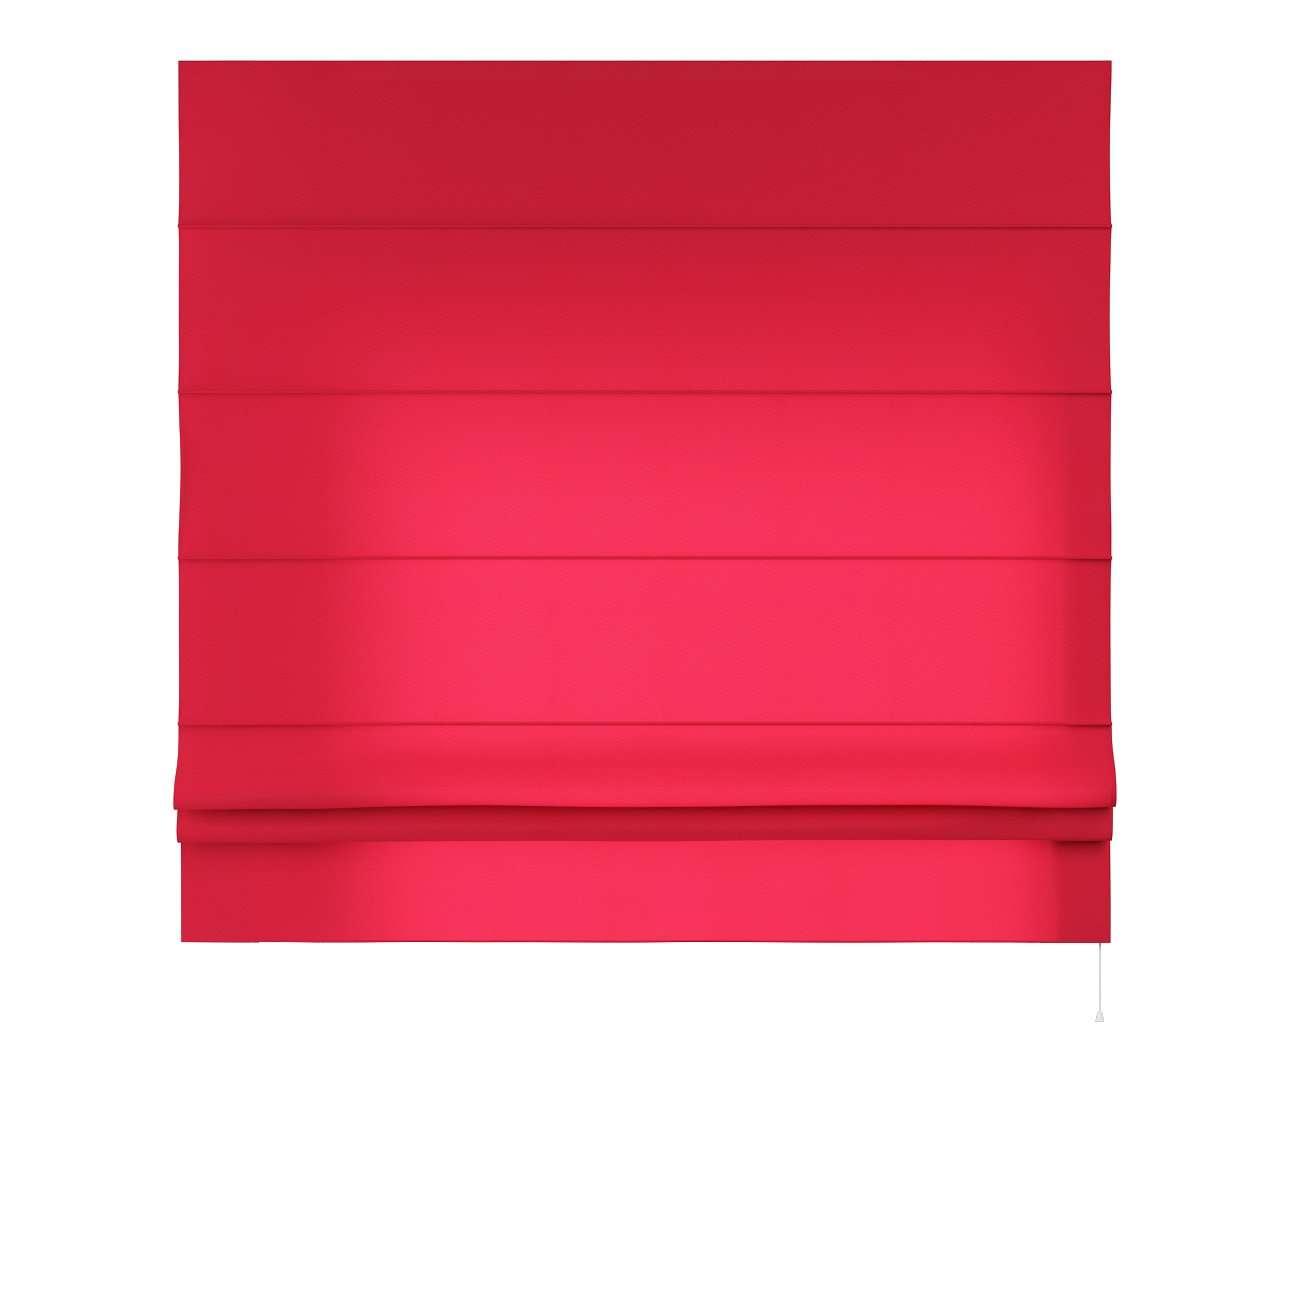 Romanetės Padva 80 x 170 cm (plotis x ilgis) kolekcijoje Quadro, audinys: 136-19